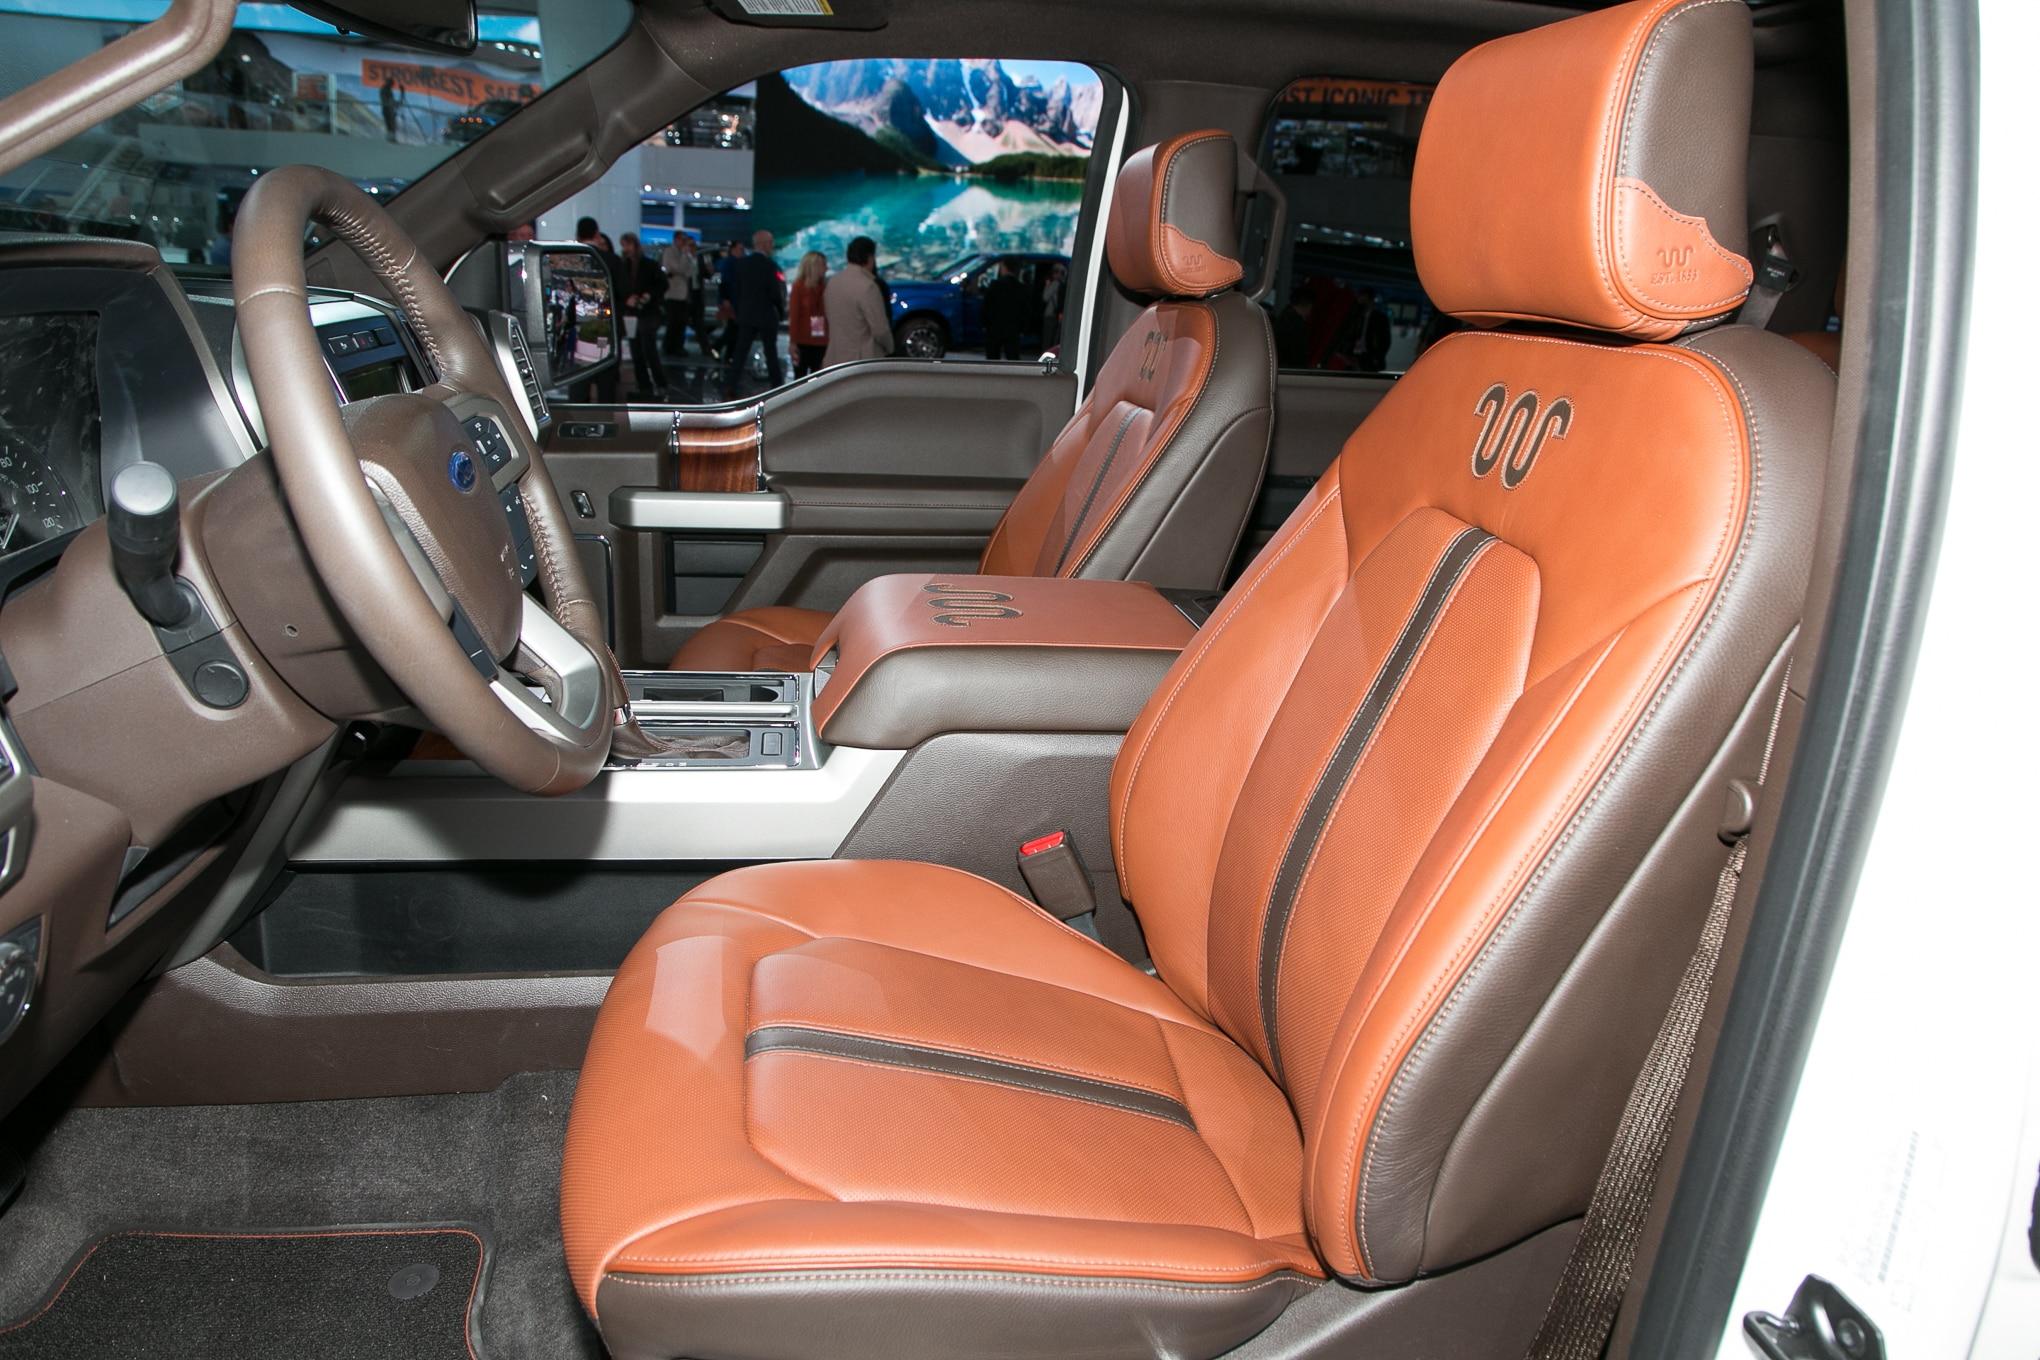 Ford F 150 Interior >> Ford F-150 2018: Primer Vistazo - Motor Trend en Español